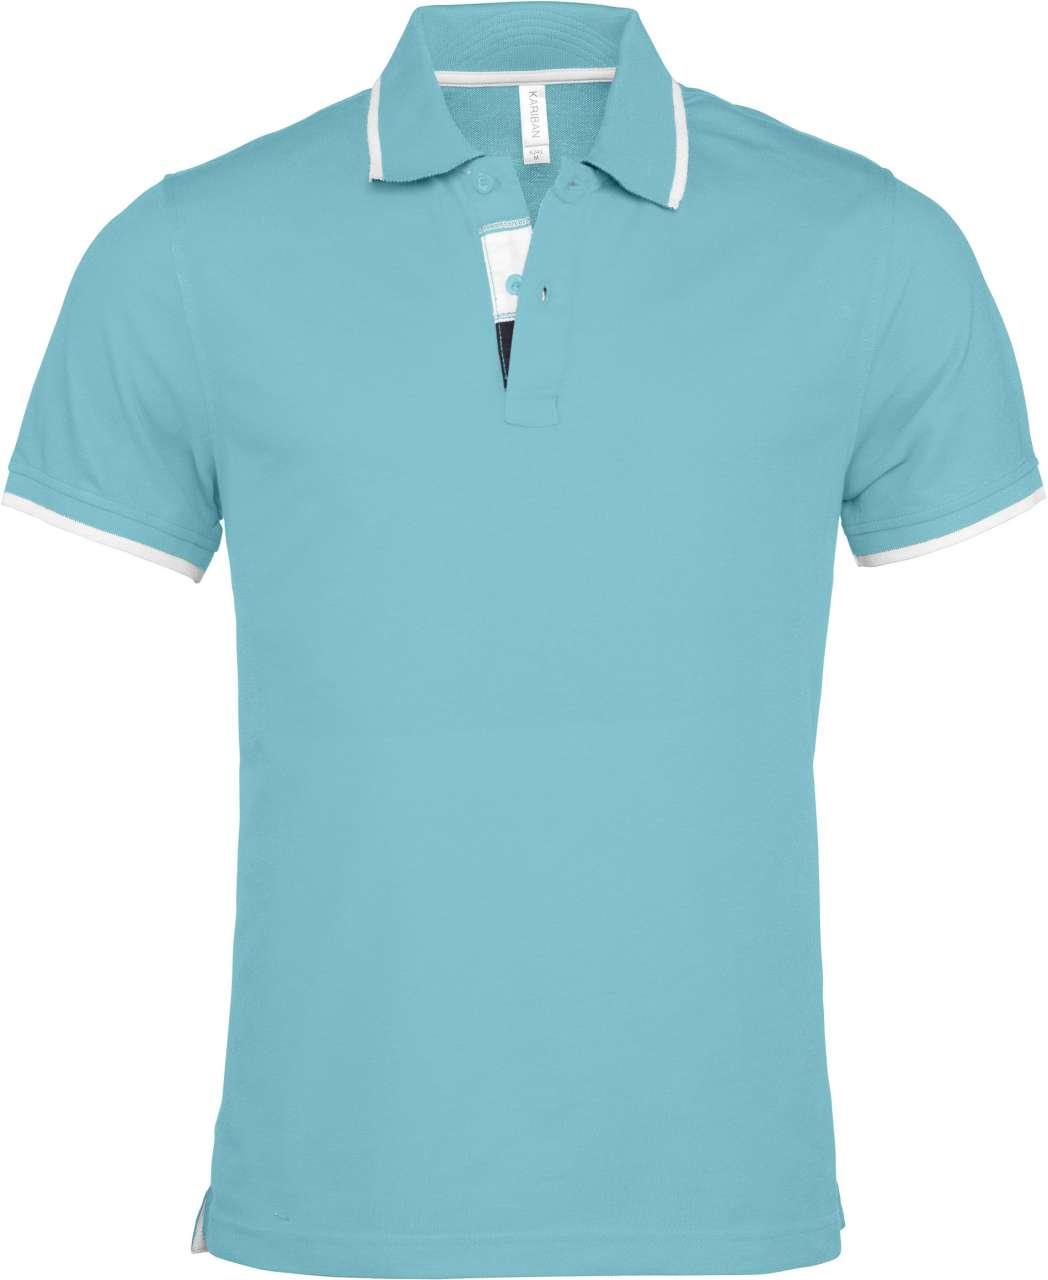 6e51ae6a9d Light Turquoise/Whit Kariban galléros piké, minőségi termék 4 féle ...